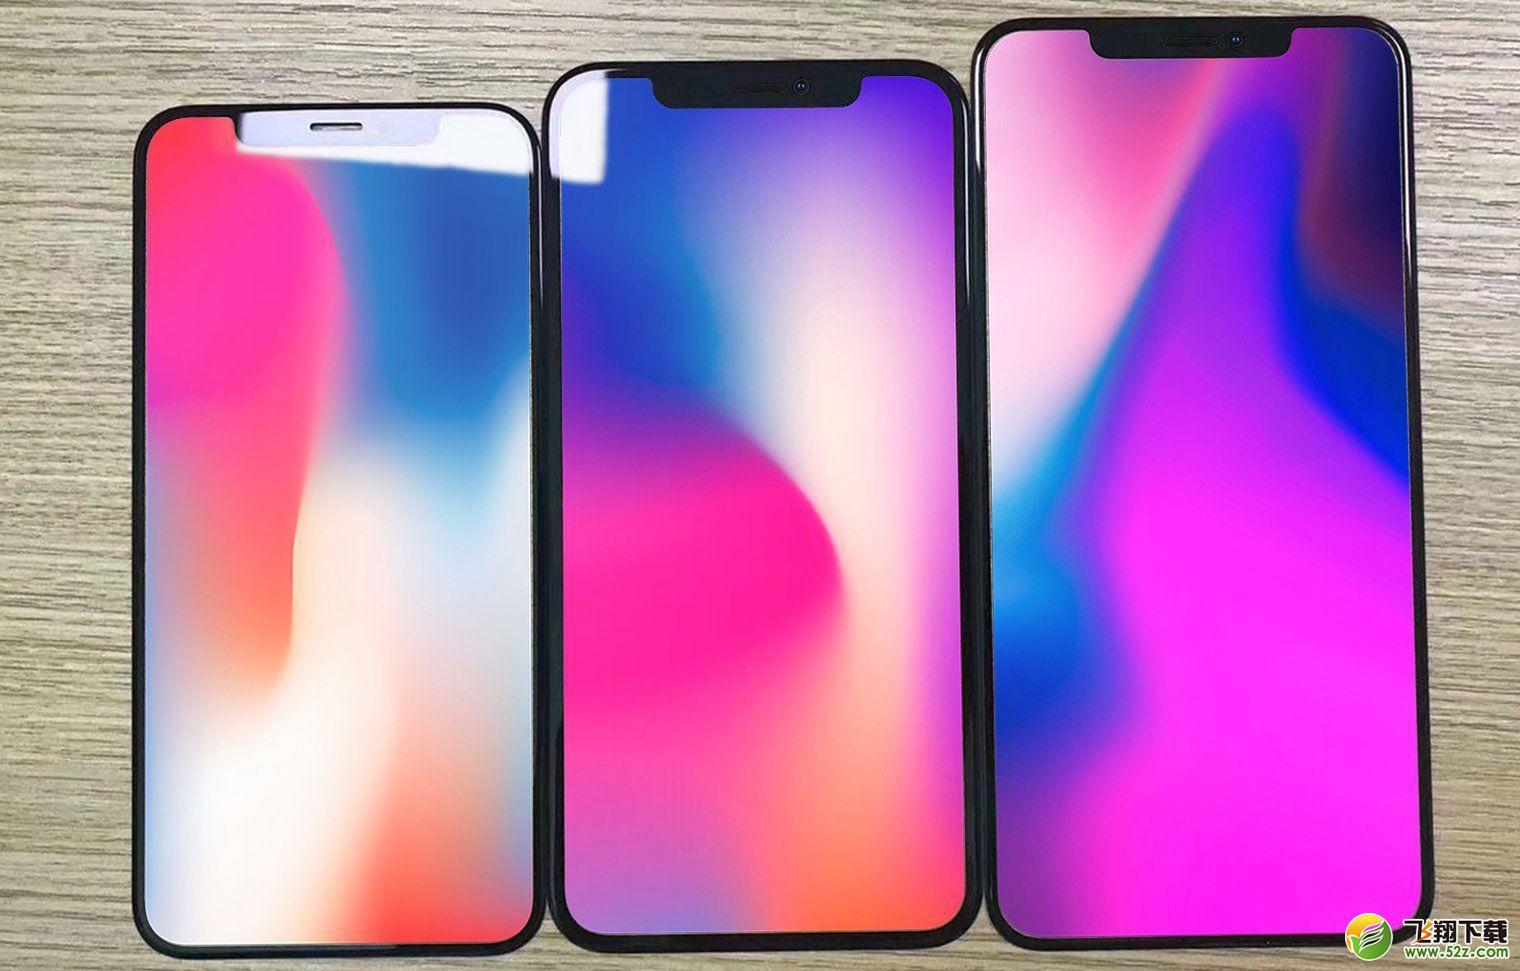 iPhoneXR和iPhoneXS MAX哪个好_iPhoneXR和iPhoneXS MAX评测对比